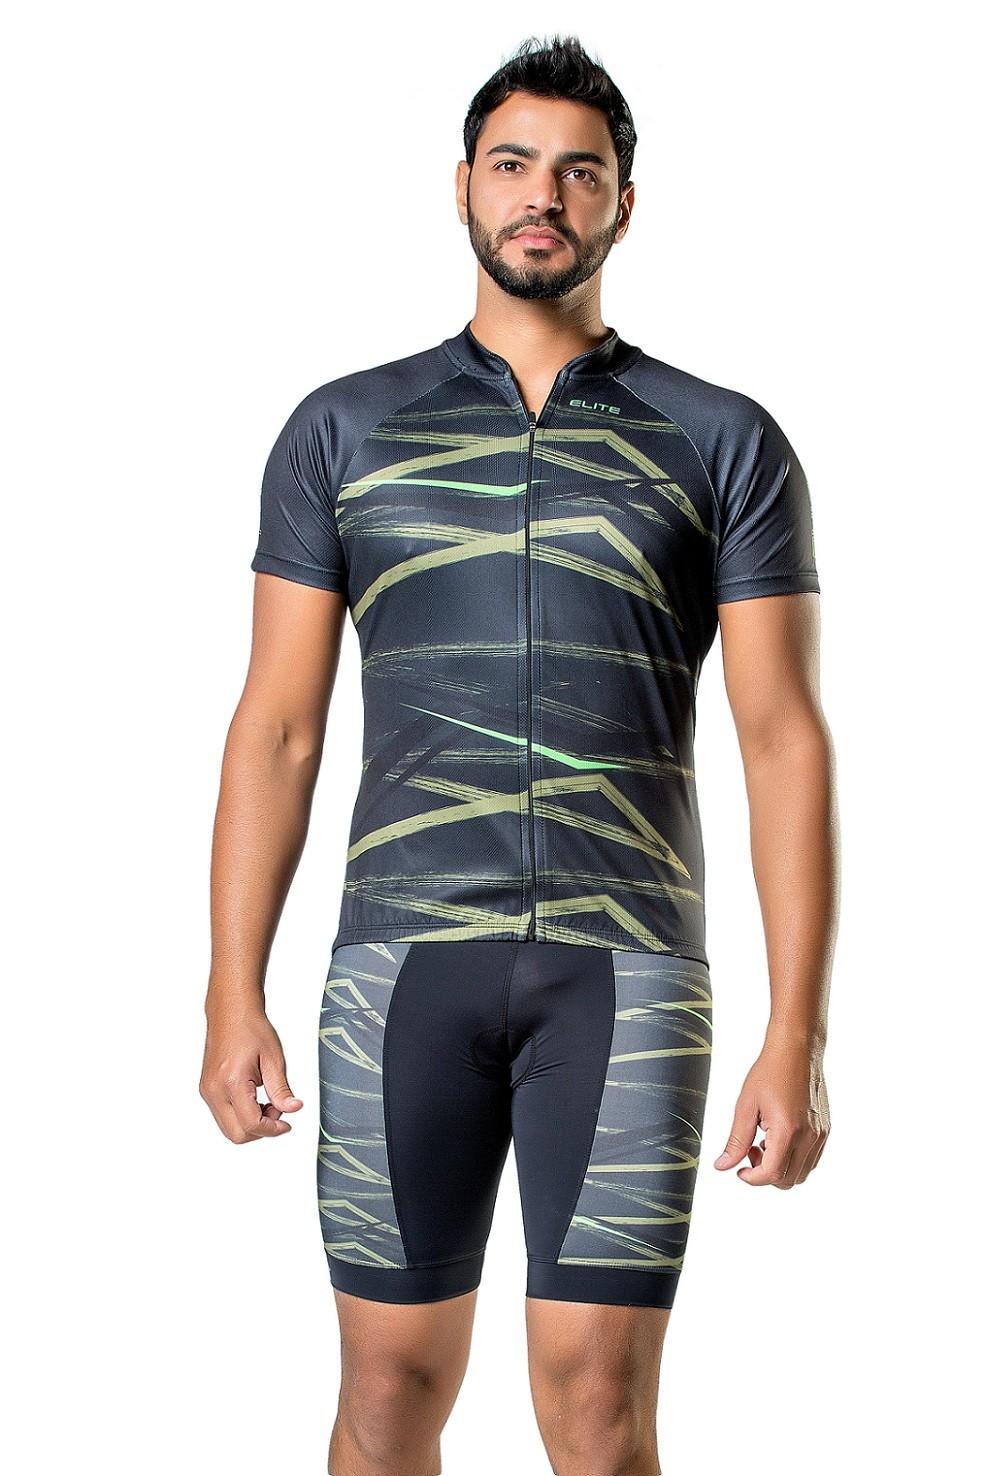 Camisa Bike Esportiva Manga Curta Masculina Elite